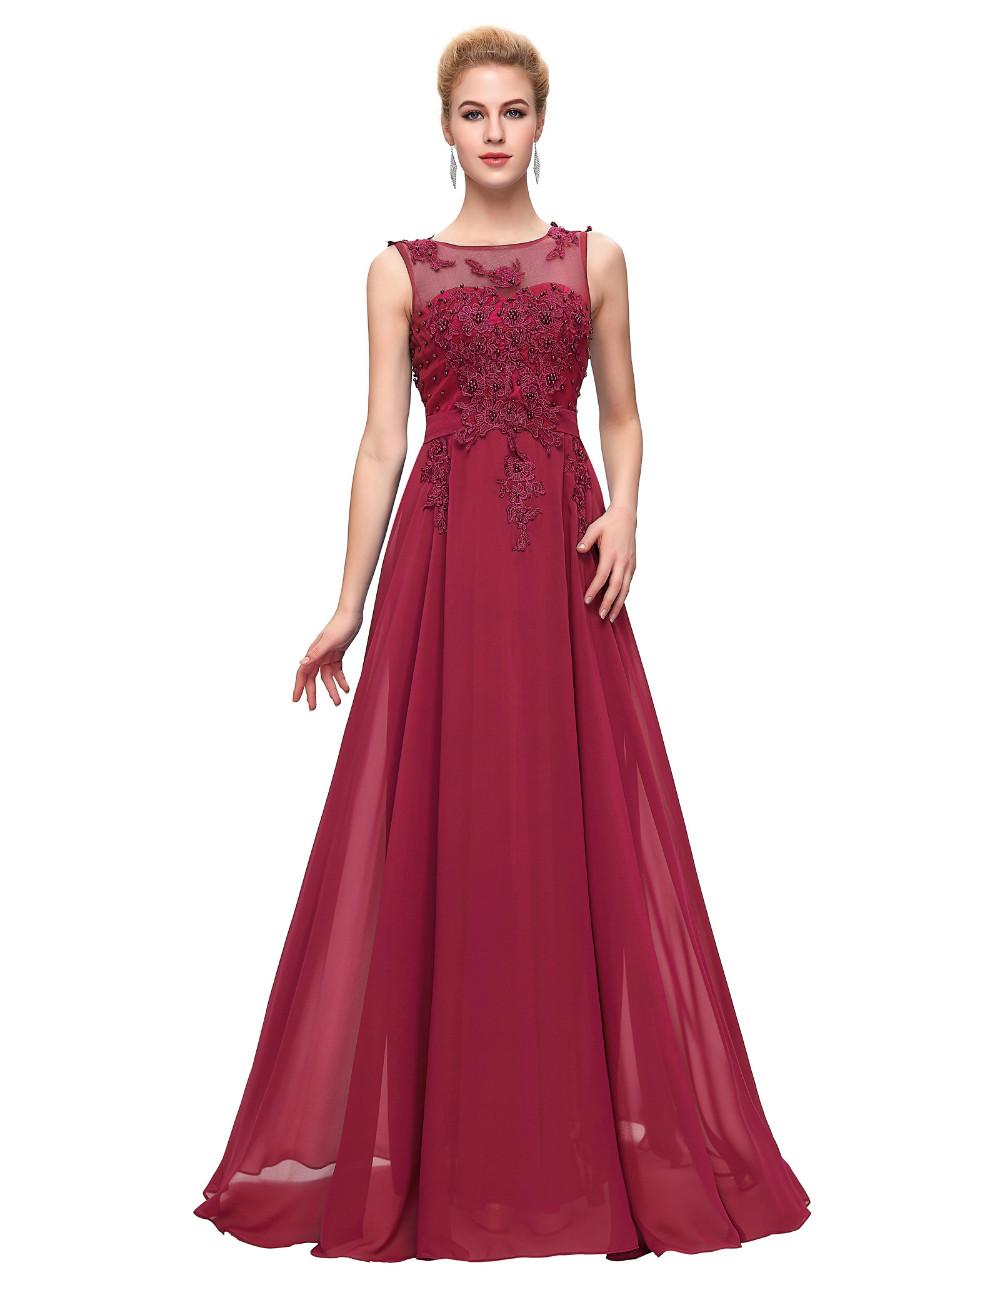 Grace Karin Elegant Long Evening Dresses 2016 Chiffon Pink Purple Red Royal Blue Black Formal Evening Dress Gown Abendkleider 54